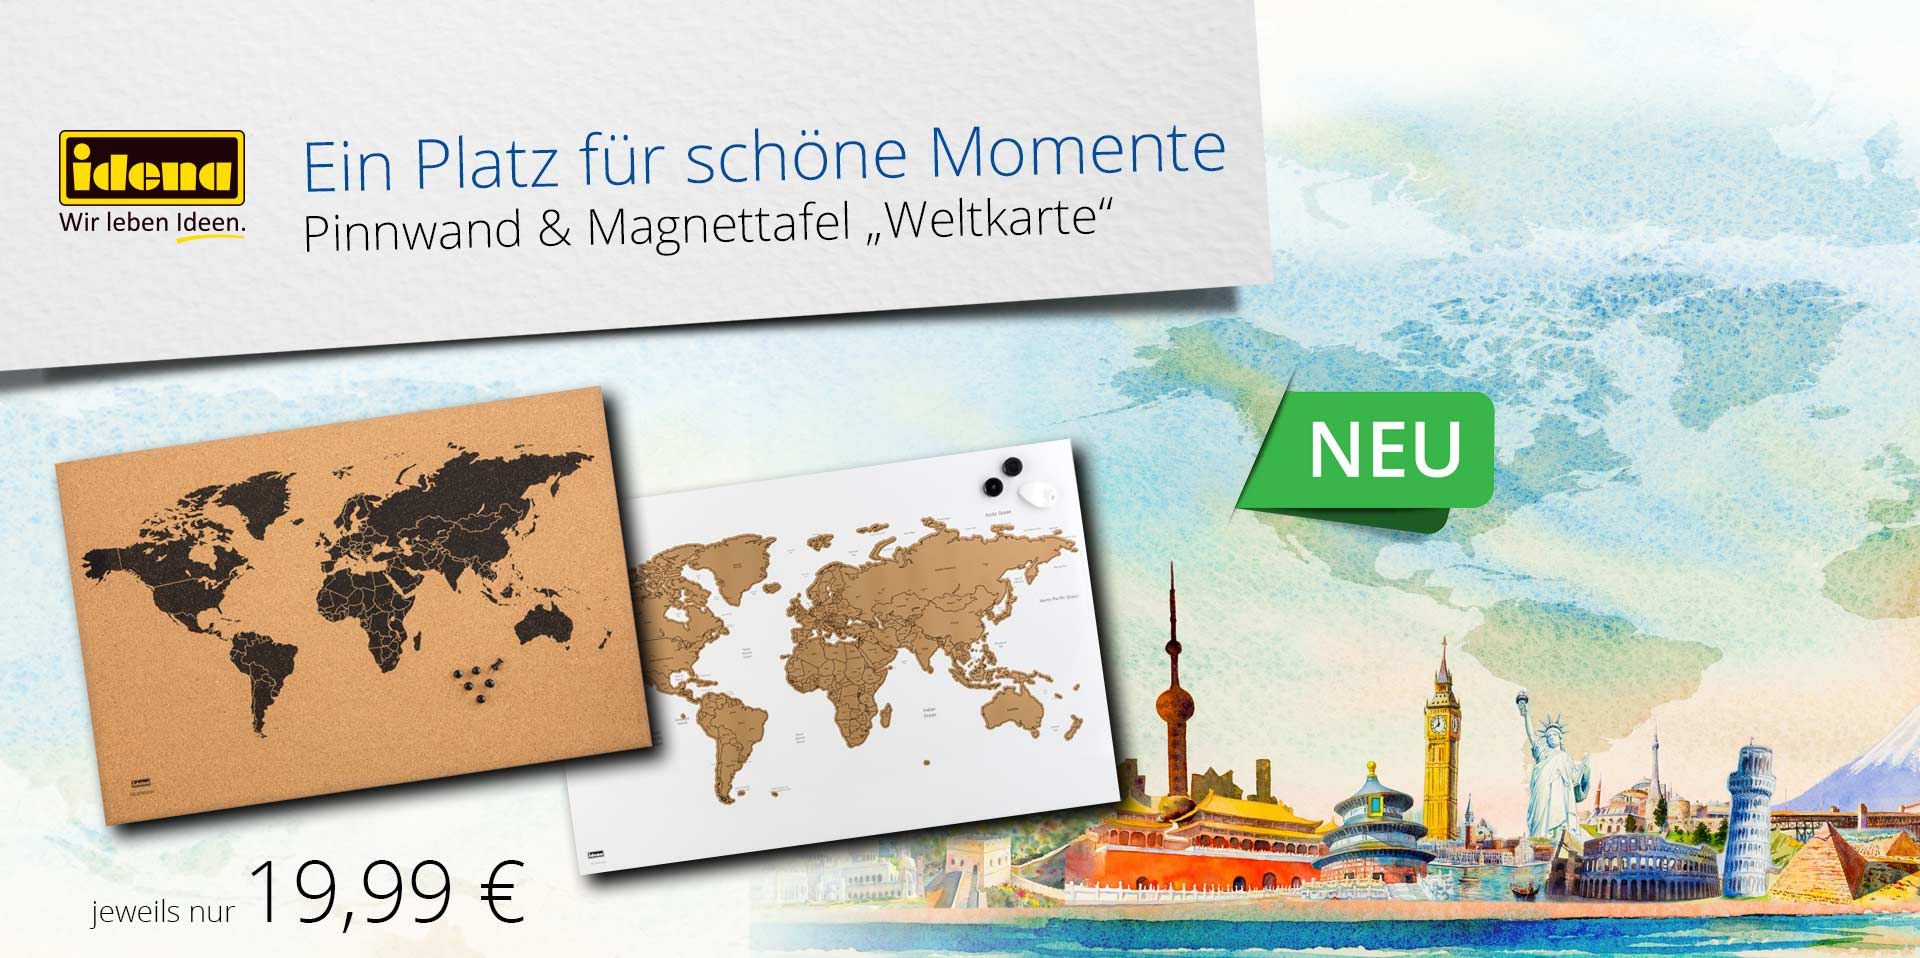 Banner Pinnwand & Magnettafel Weltkarte